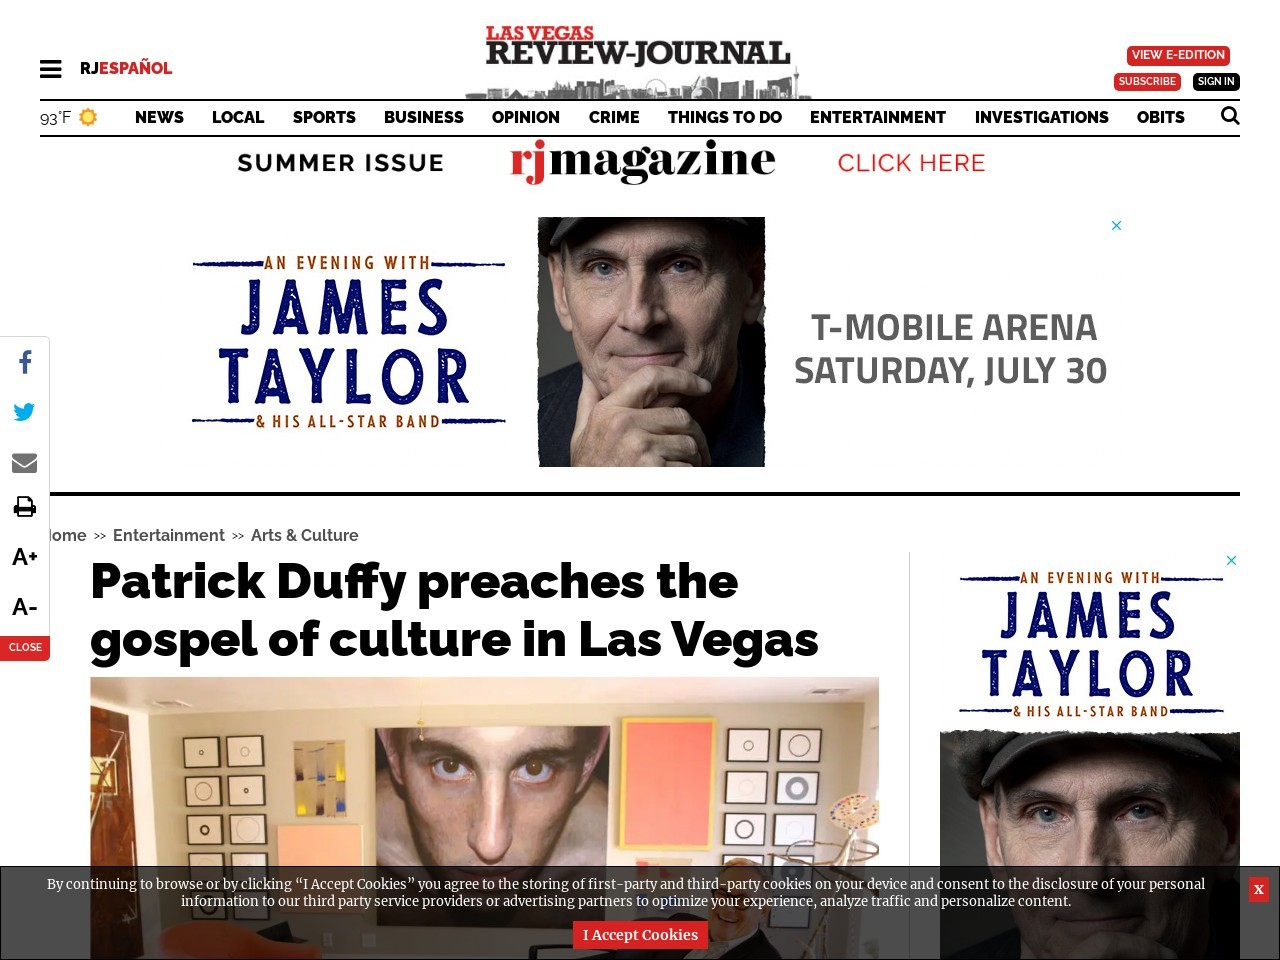 Patrick Duffy preaches the gospel of culture in Las Vegas